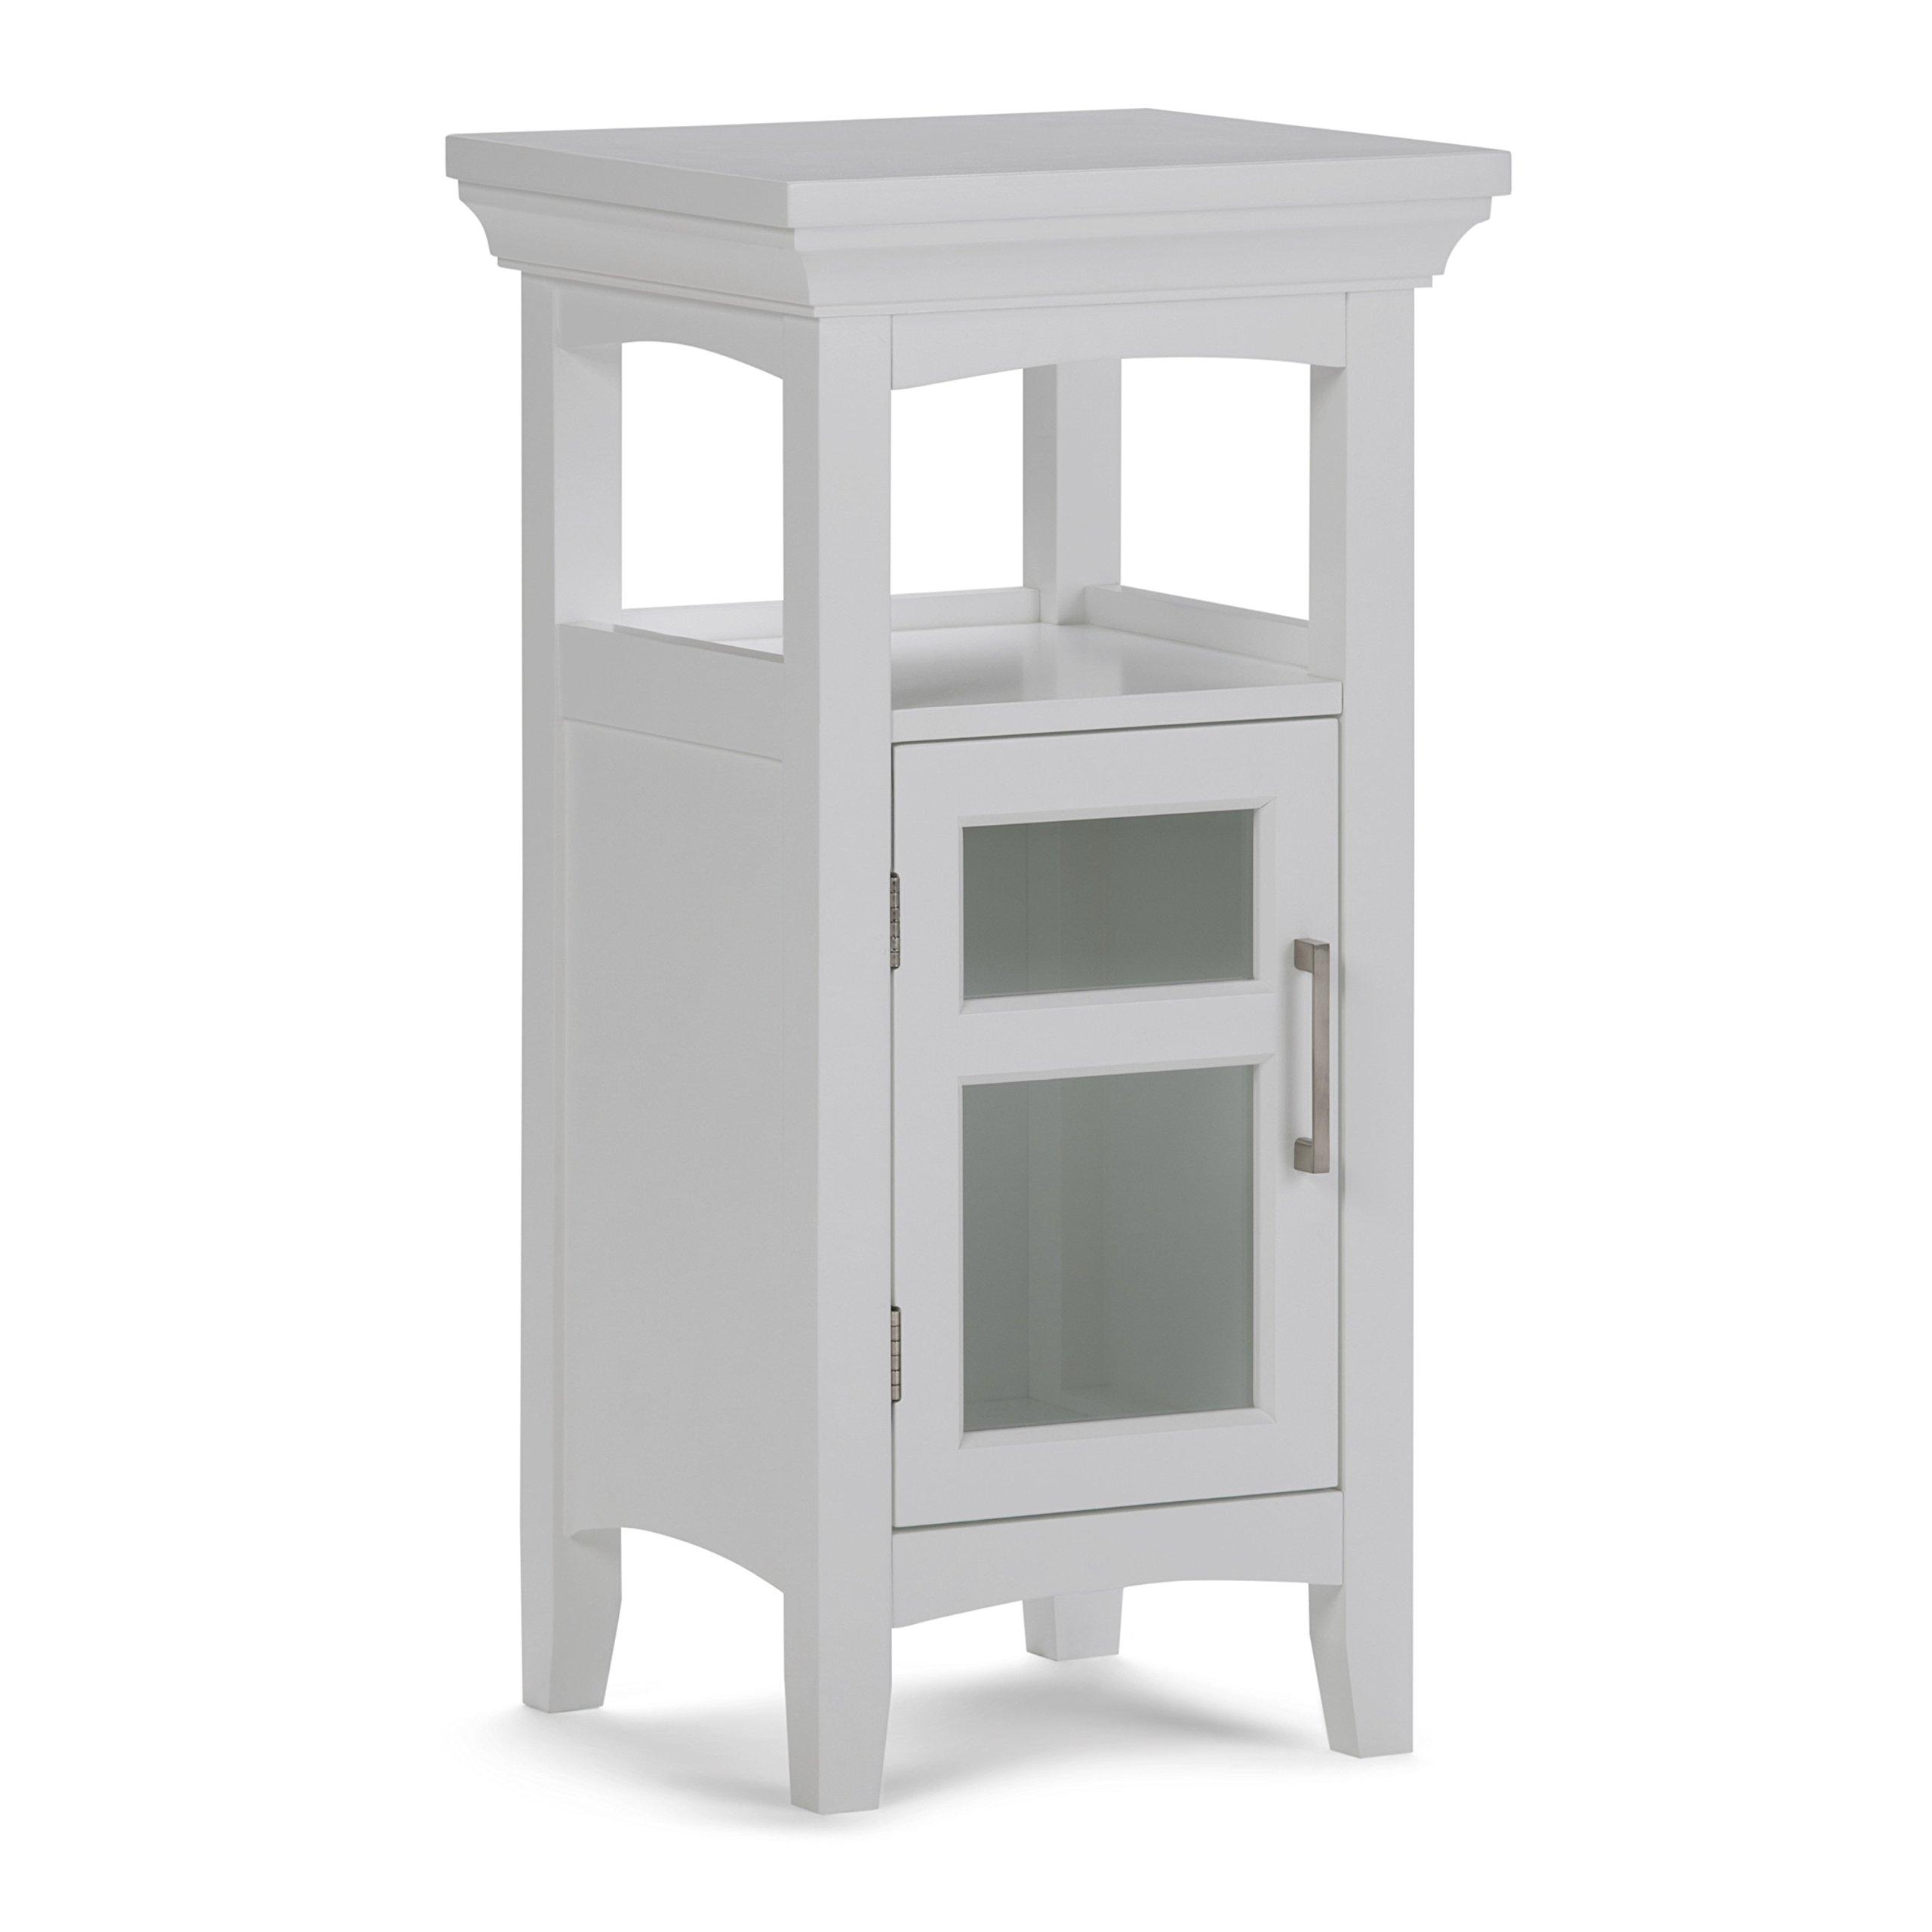 Simpli Home Avington Floor Storage Cabinet, White